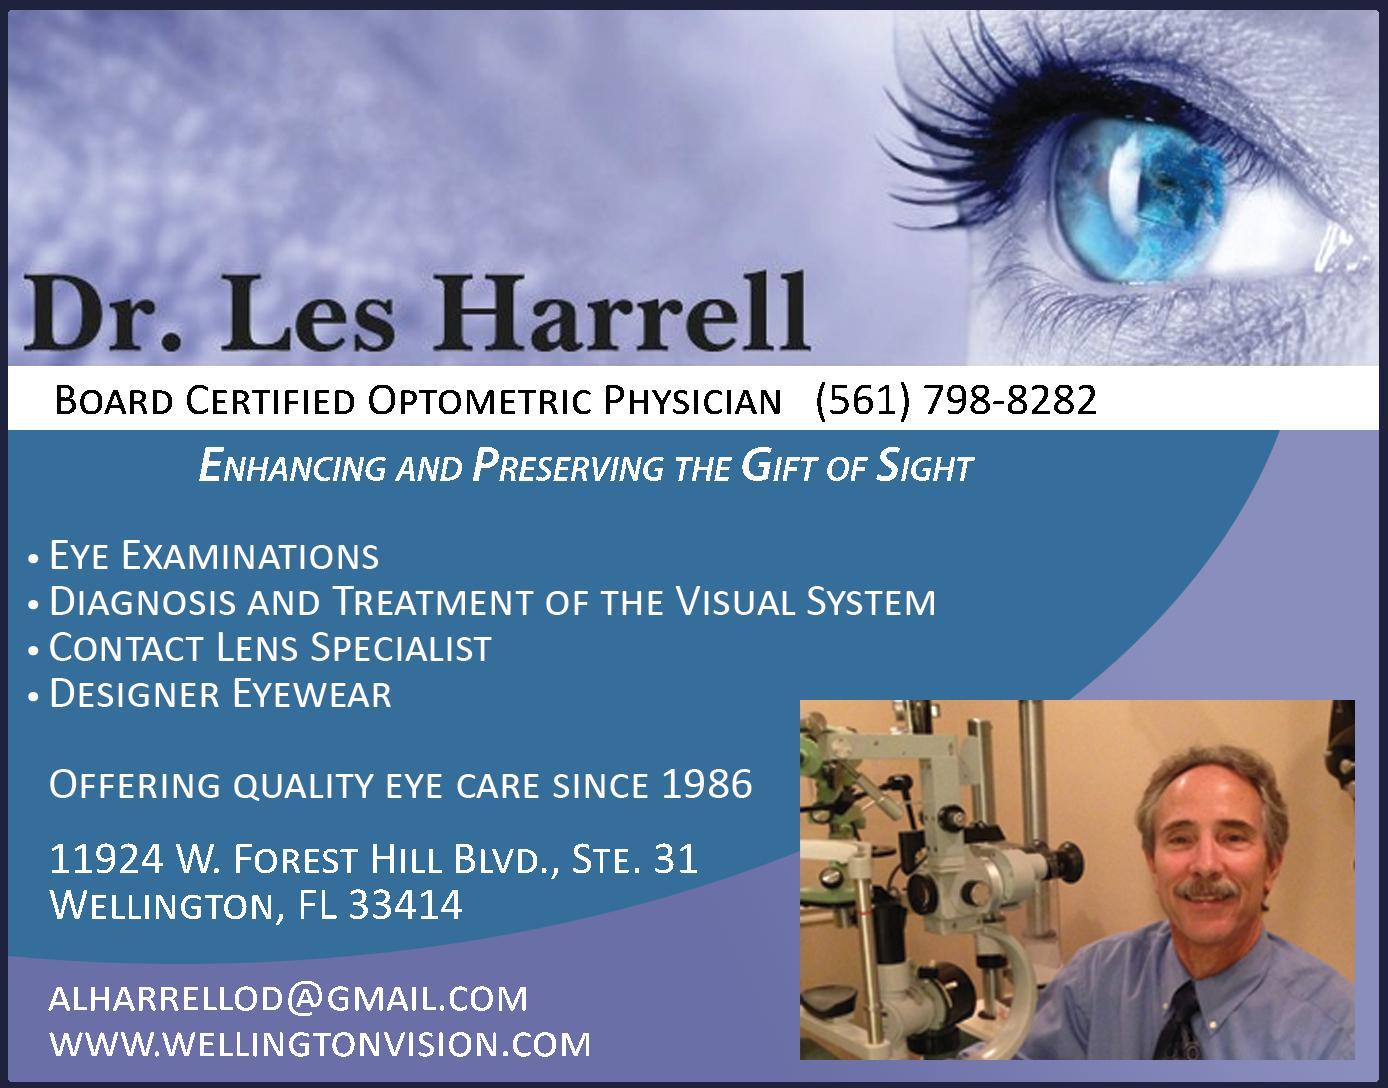 Dr. Les Harrell, Optometric Physician